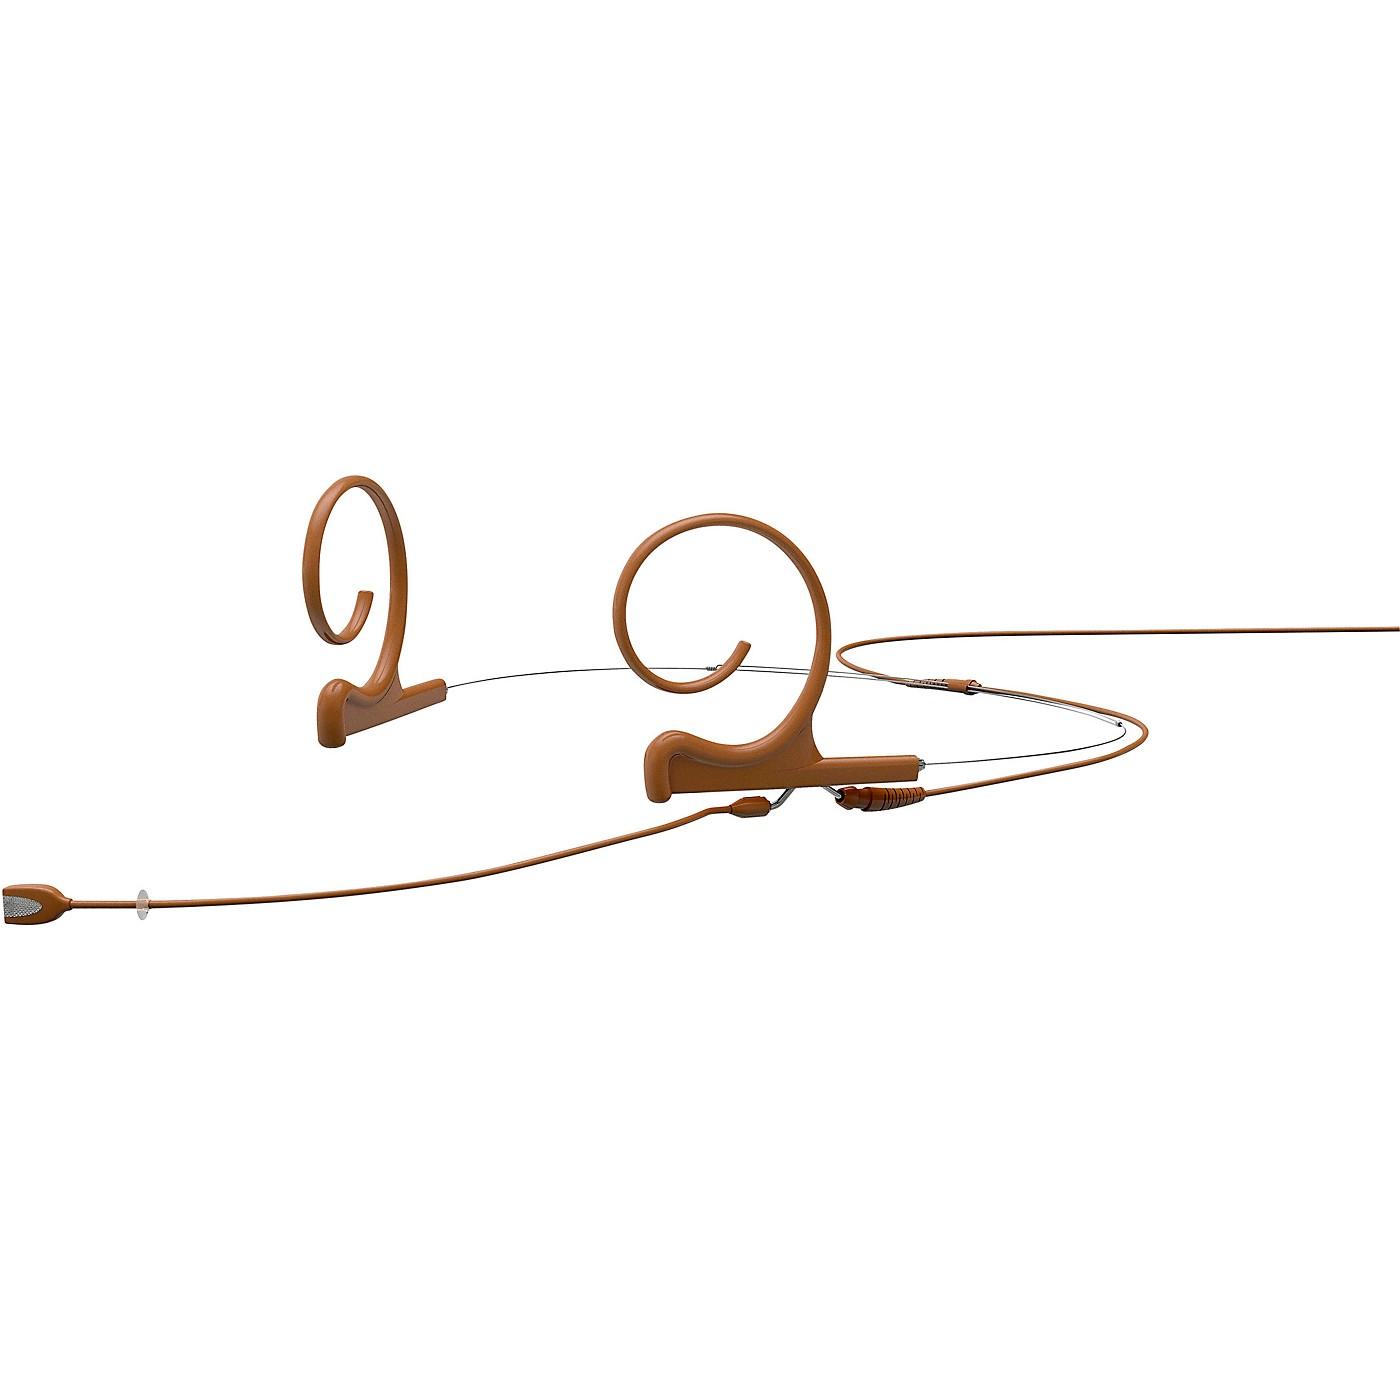 DPA Microphones d:fine FID Slim Directional Headset Microphone—Dual Ear, 100mm Boom, Brown thumbnail